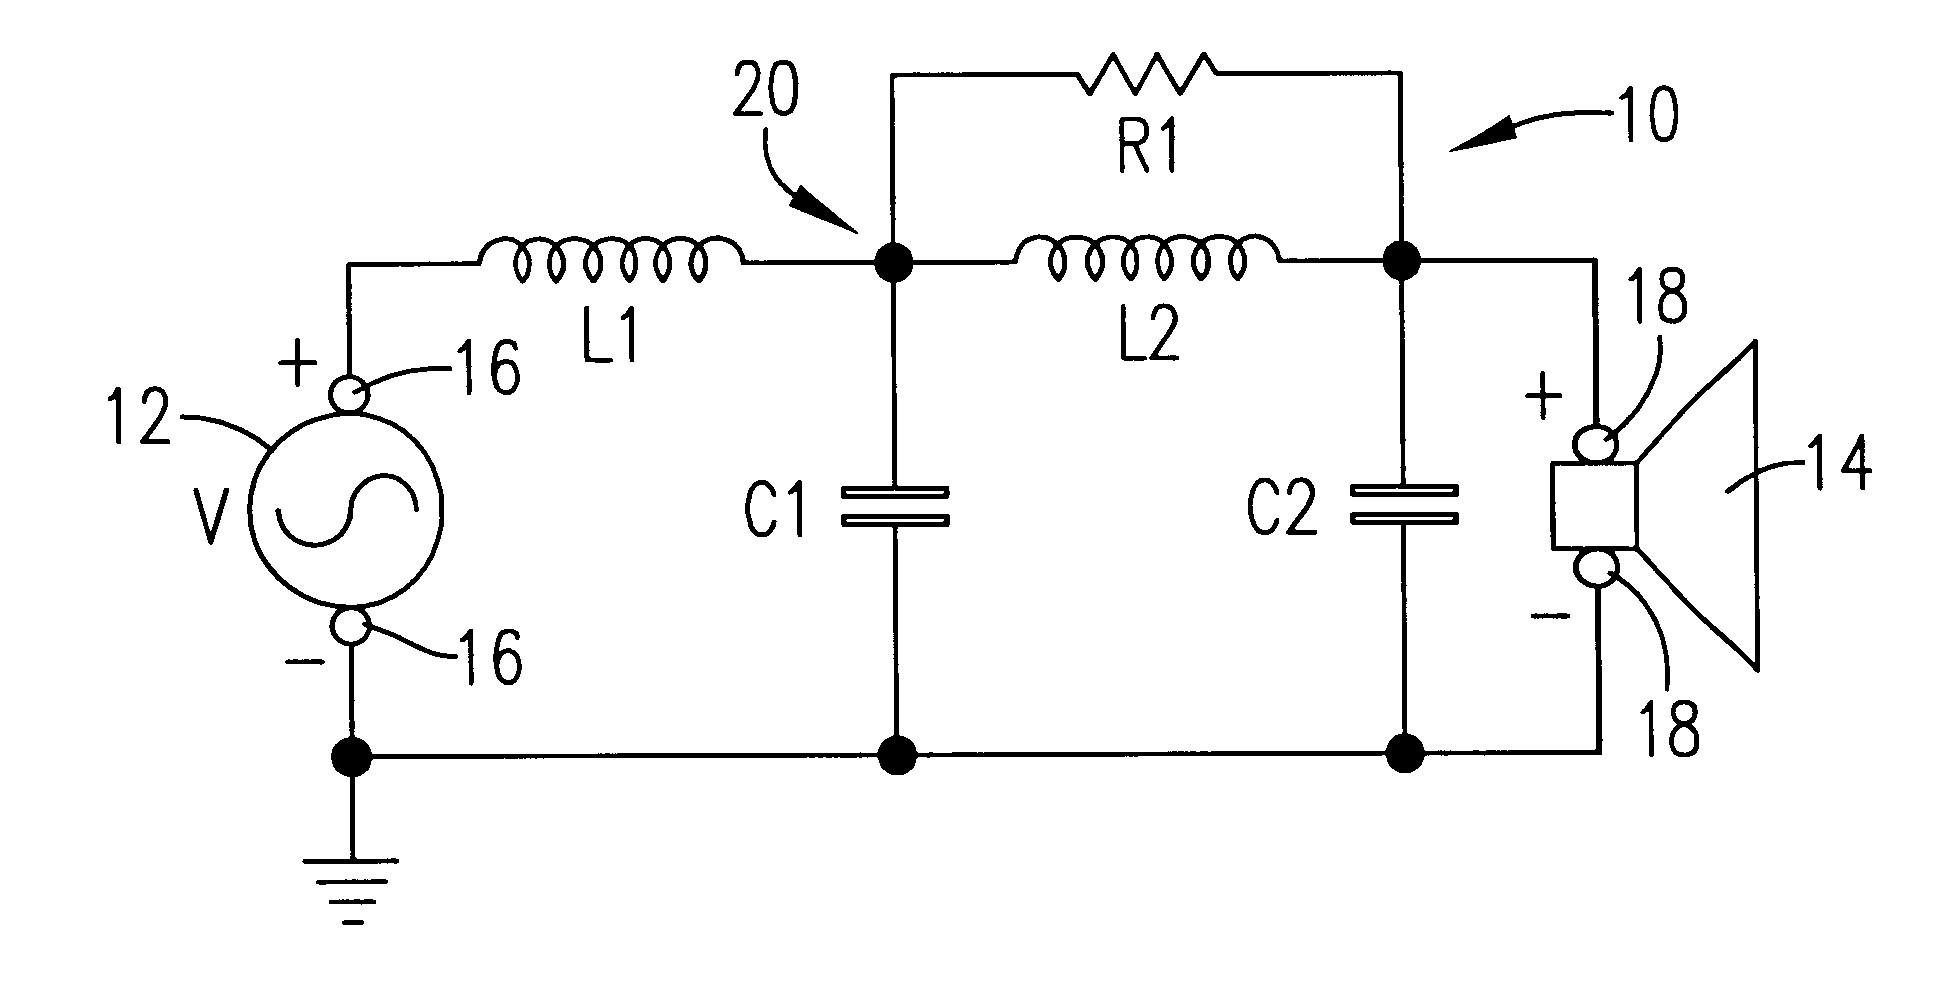 Gallery of Unique Light Wiring Diagram